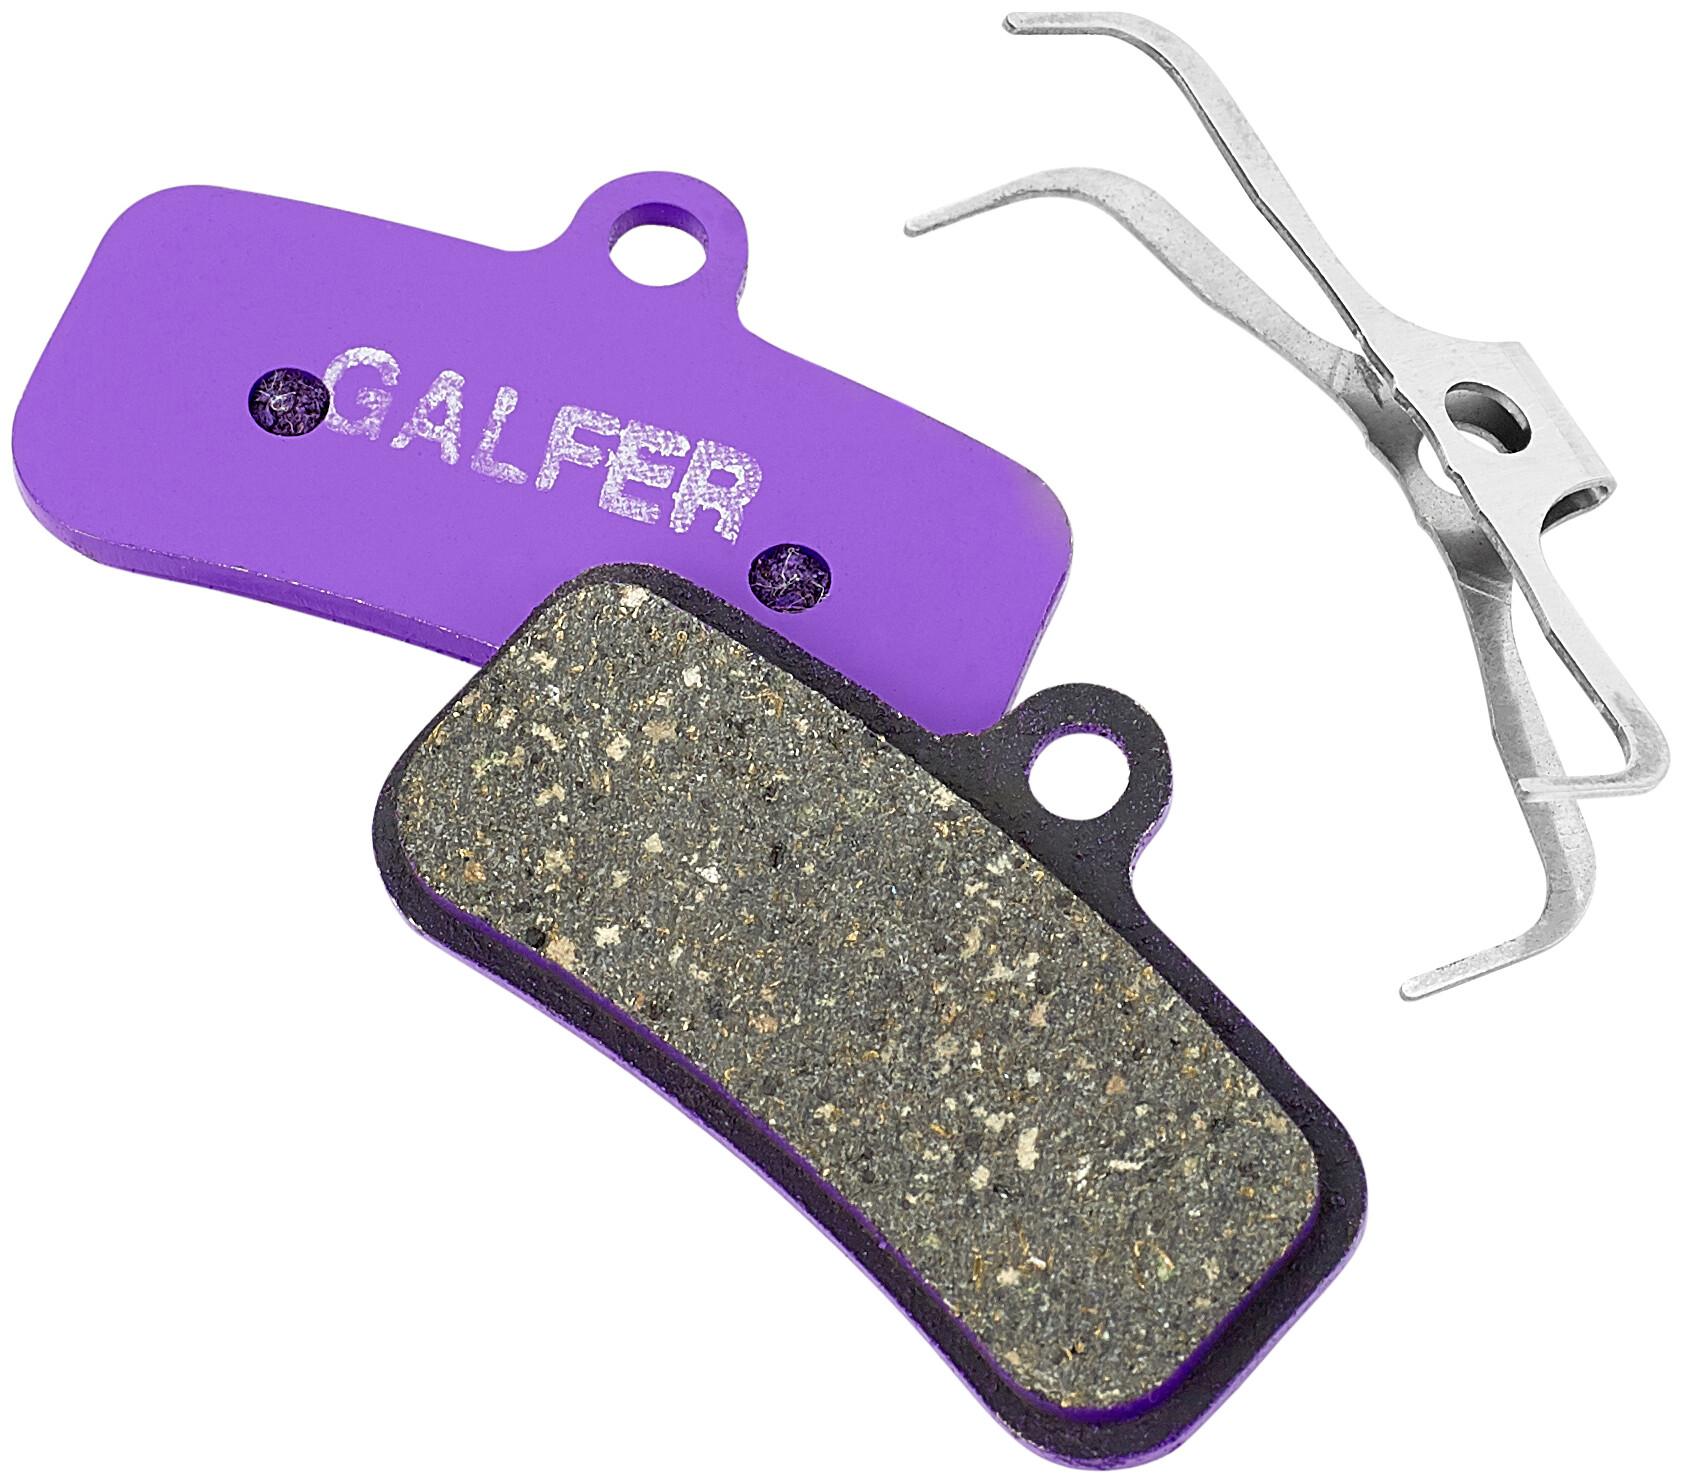 RSC and Guide Re brakes GALFER BIKE Purple e-bike compound pads for Avid Code R